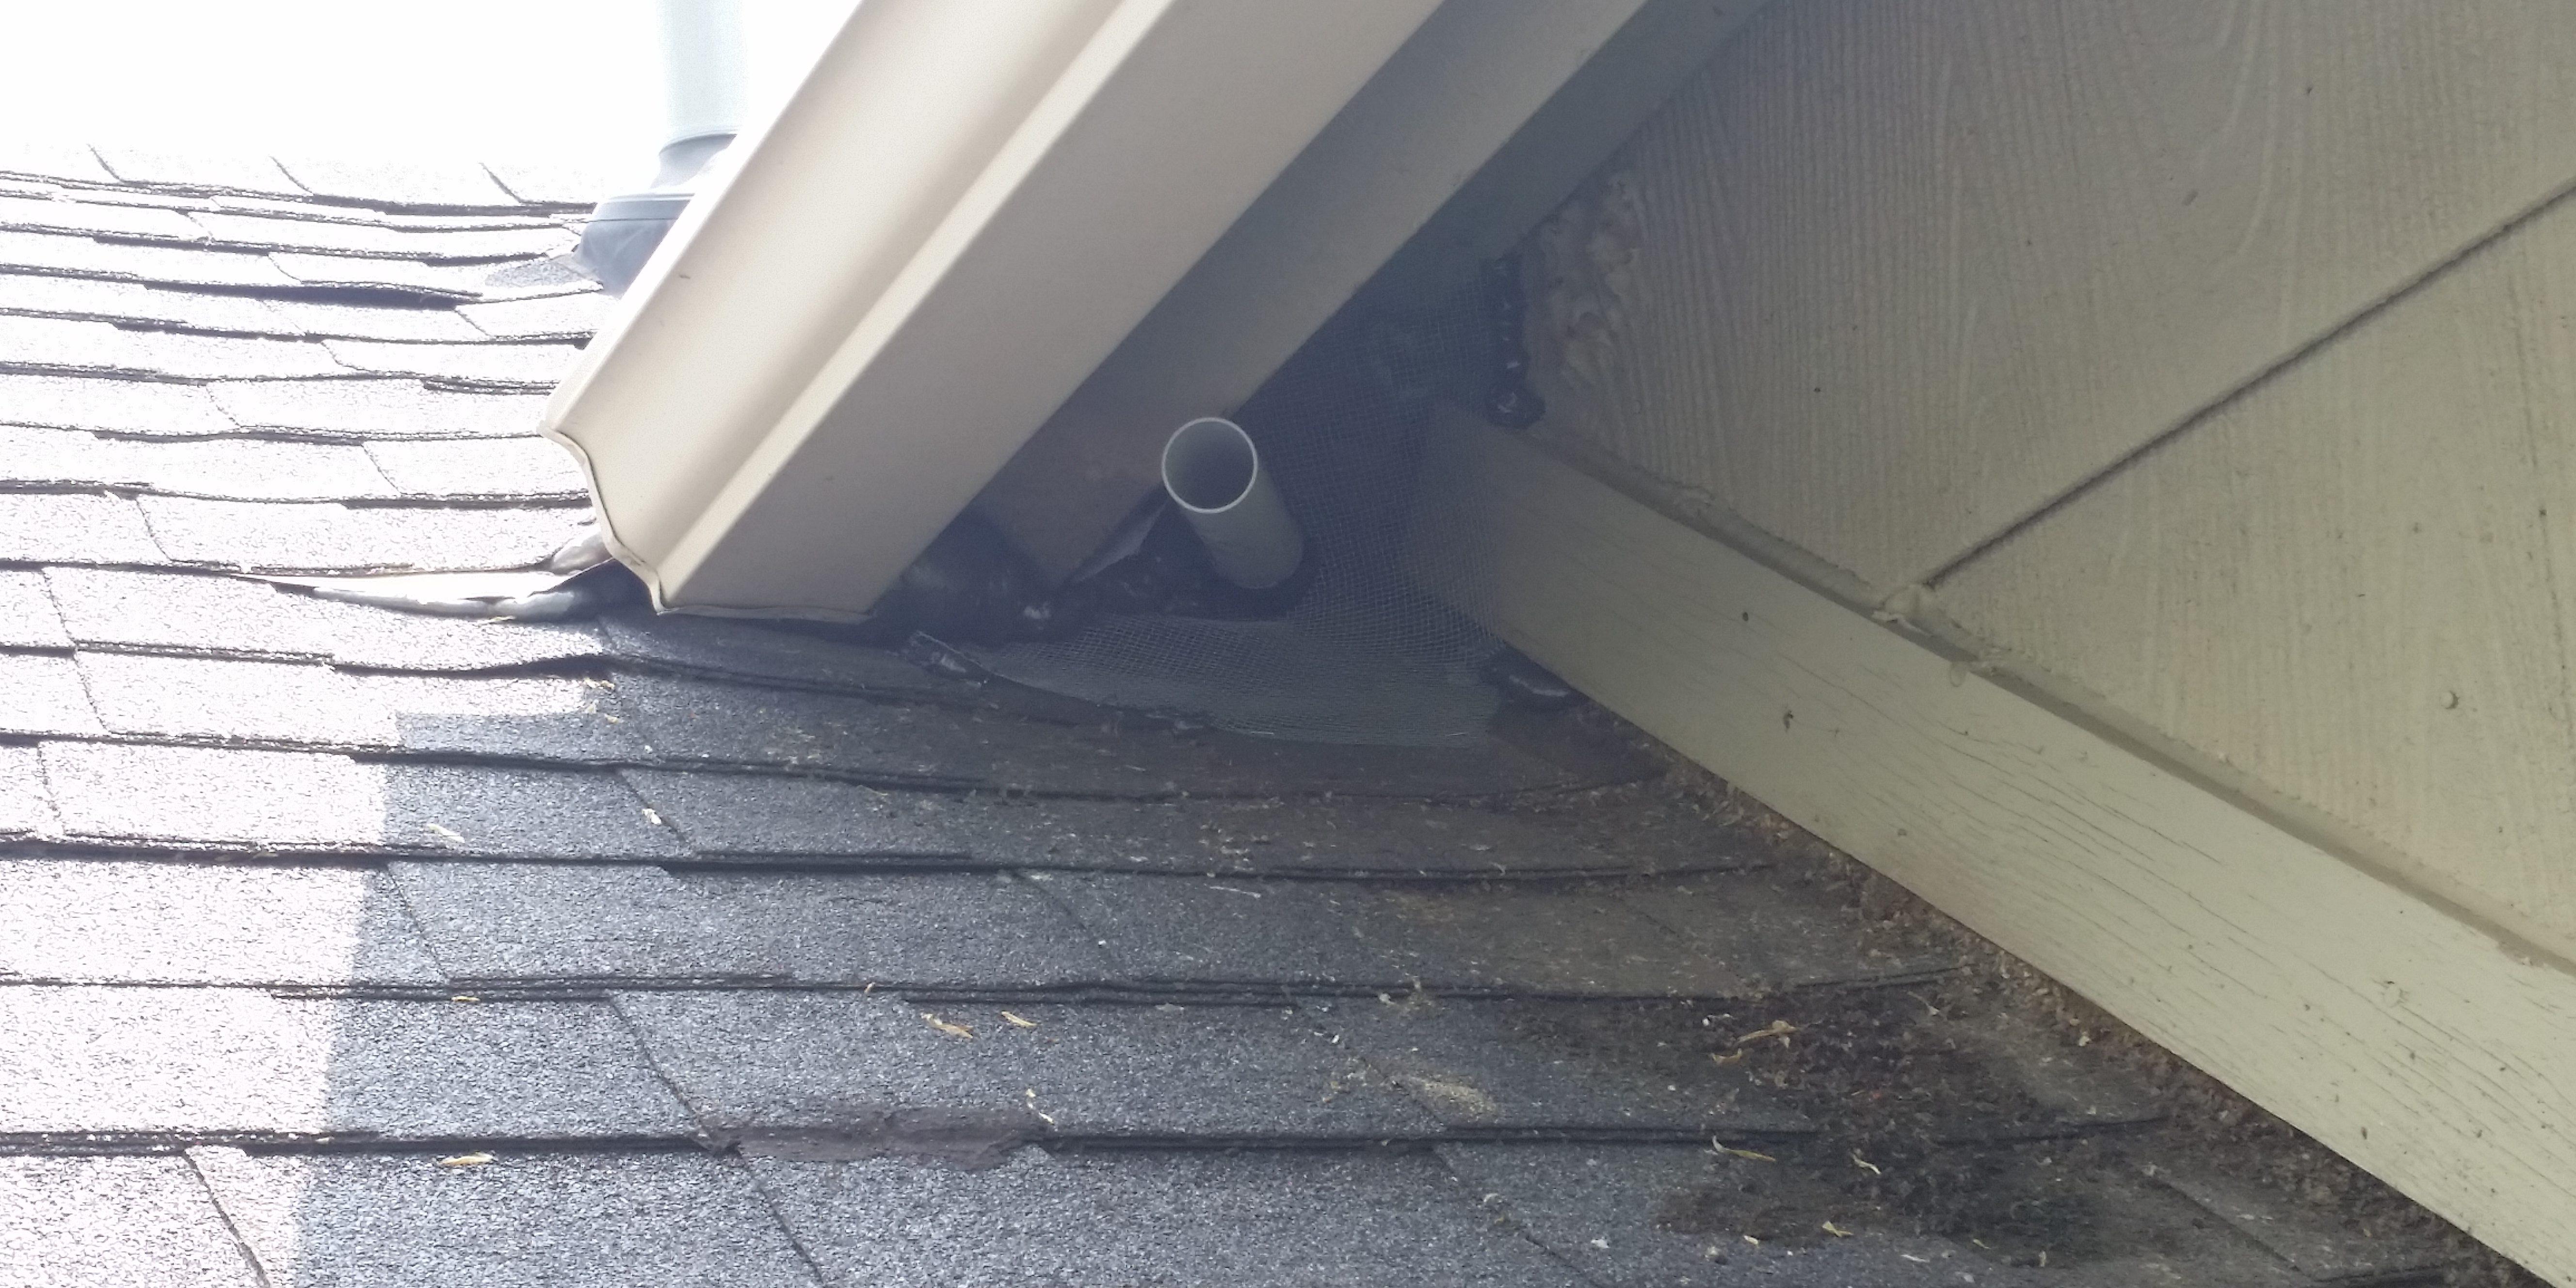 Bats Entering Through Roof Gap